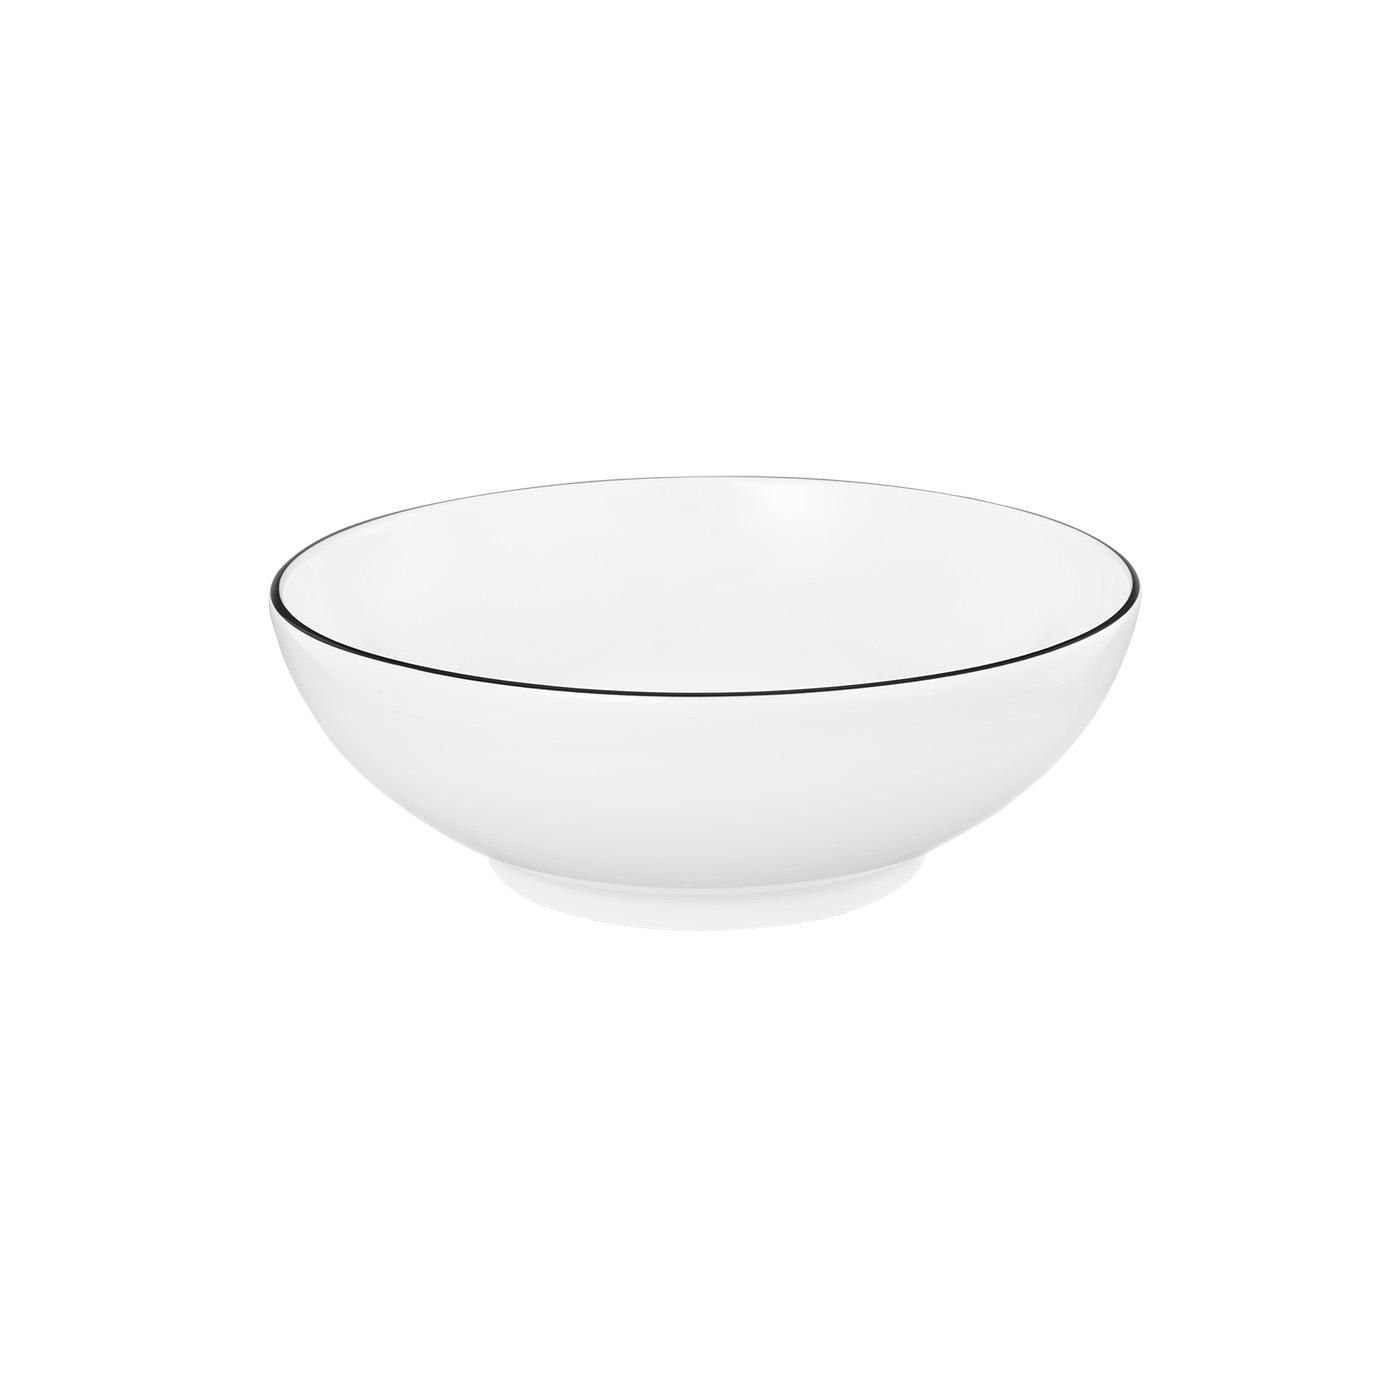 seltmann weiden lido 6 st ck dessertschale 10826 black line 15 cm dessertschalen porzellan. Black Bedroom Furniture Sets. Home Design Ideas